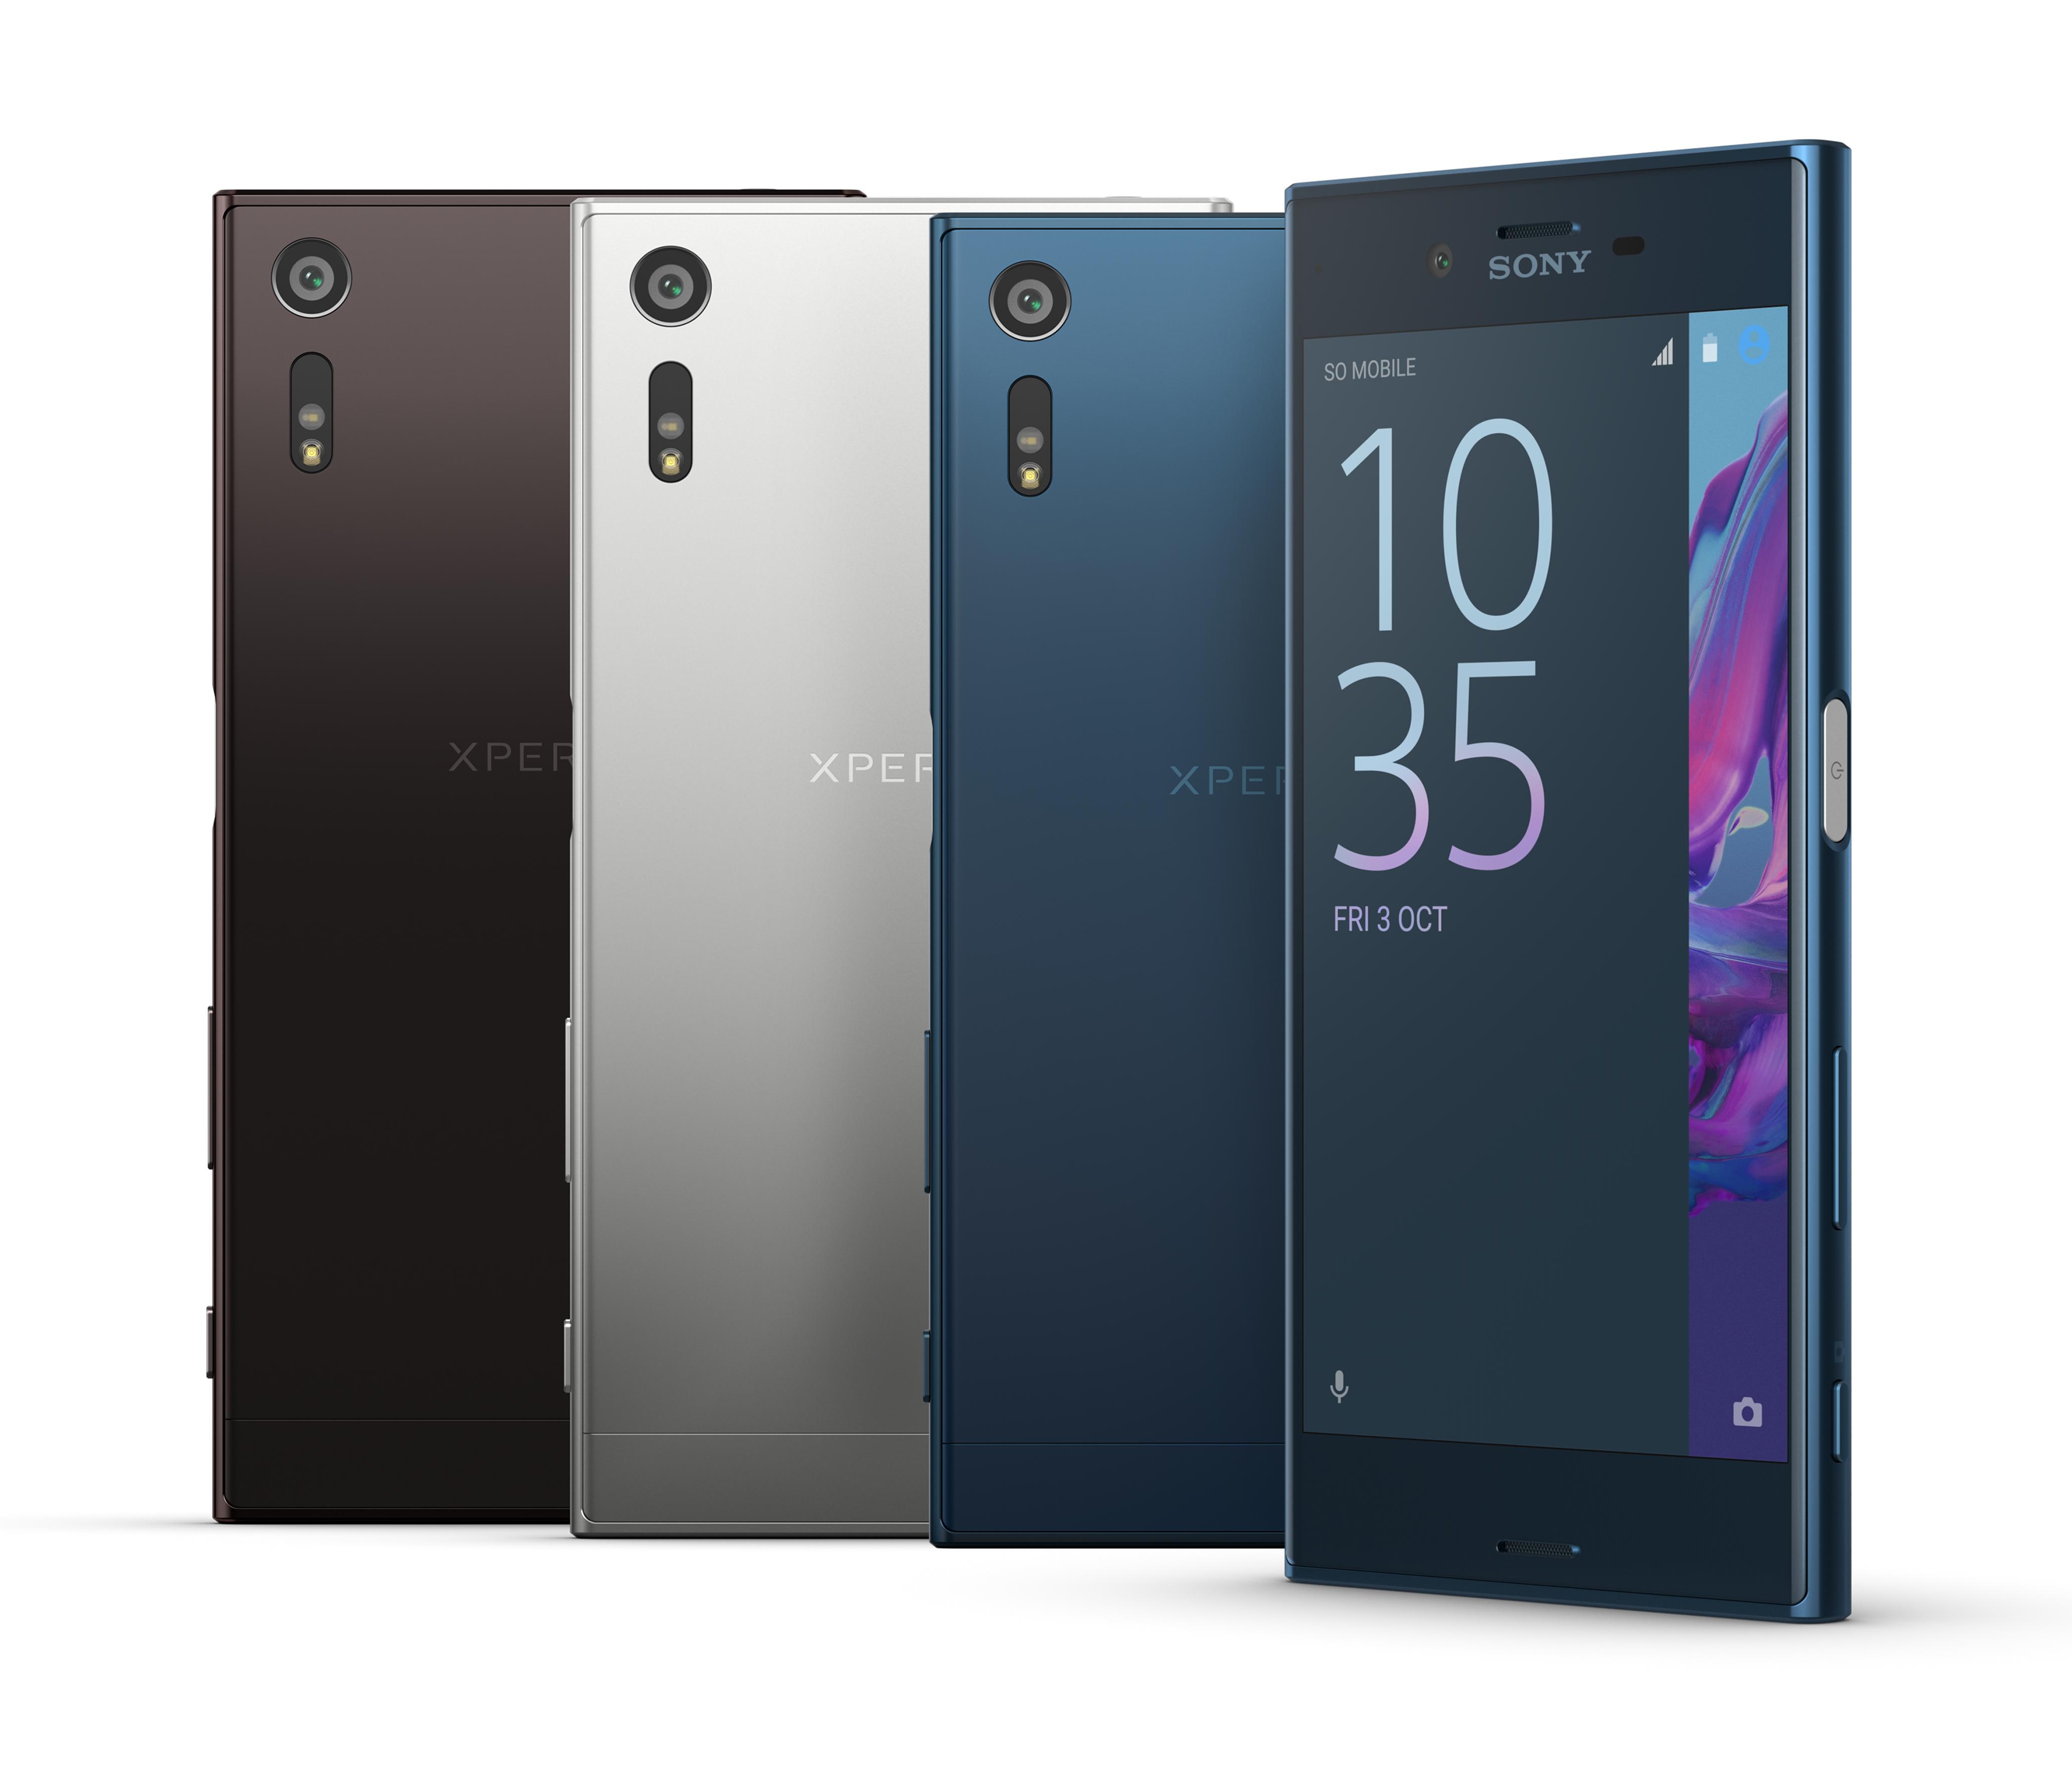 IFA 2016: arrivano i nuovi Sony Xperia XZ e X Compact